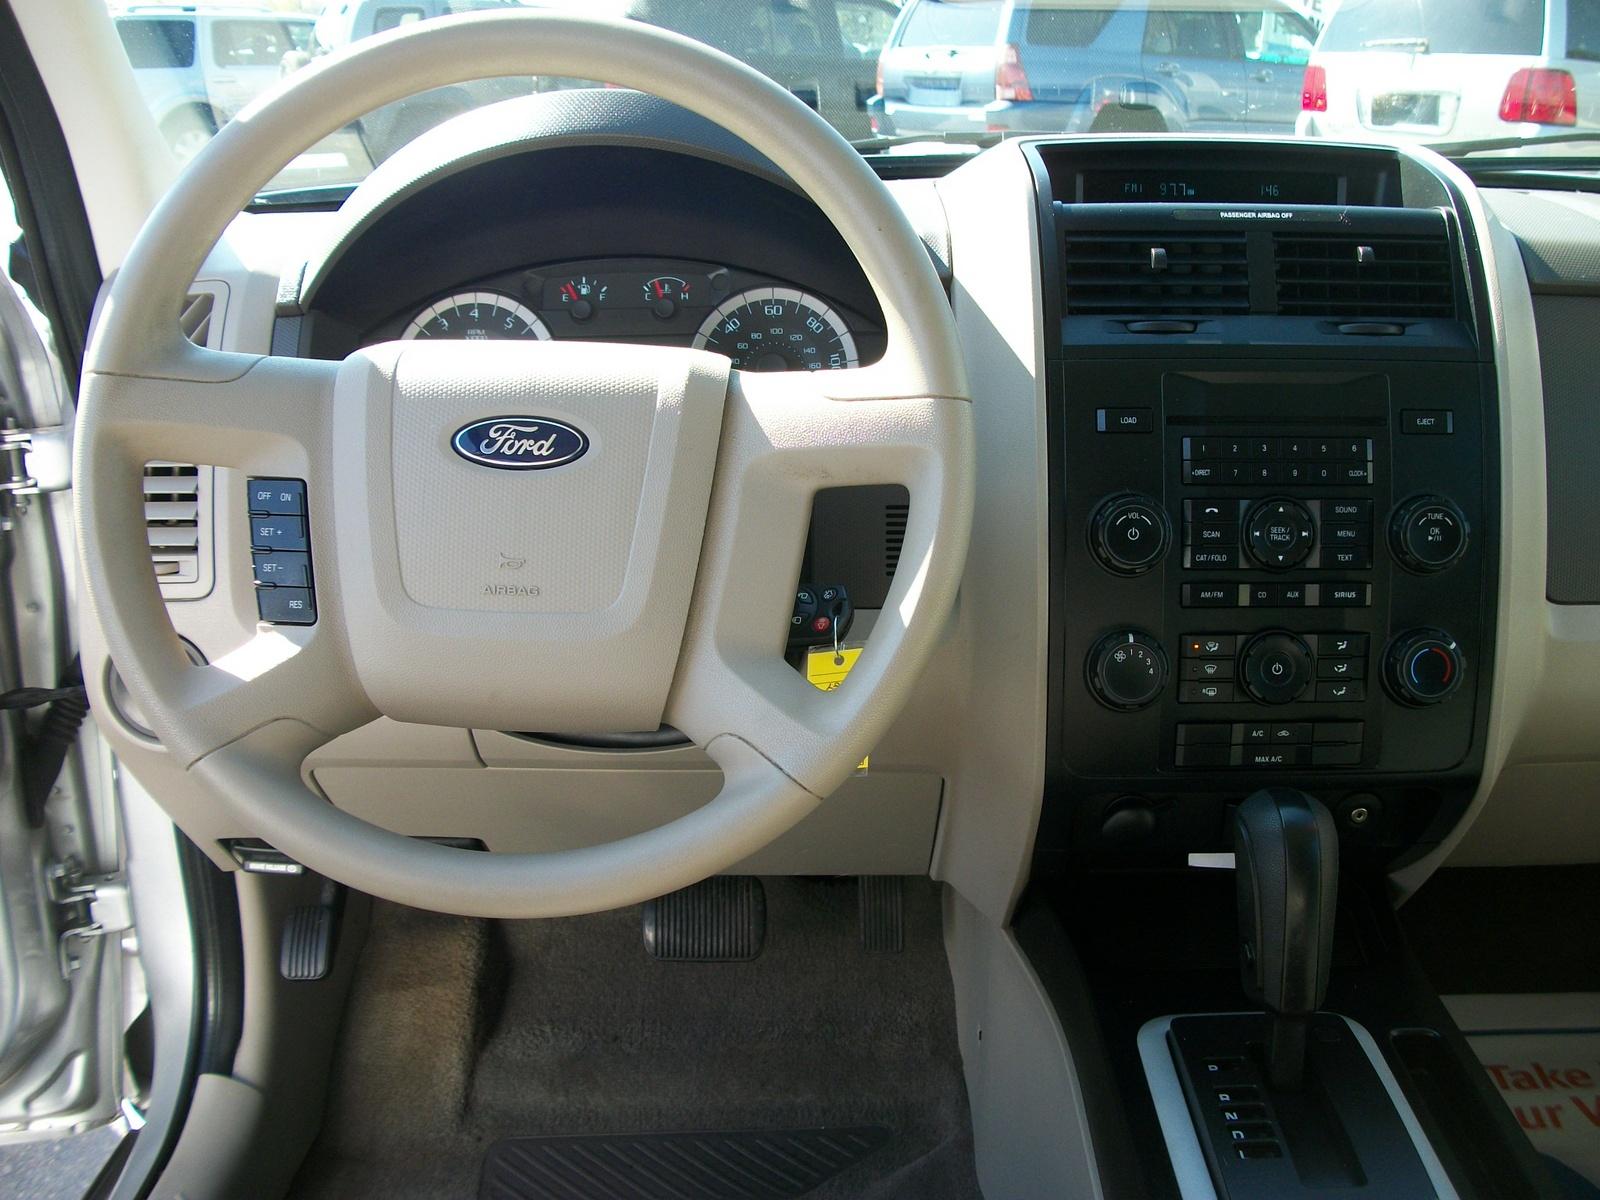 2008 Ford Escape Xlt >> 2010 Ford Escape - Pictures - CarGurus